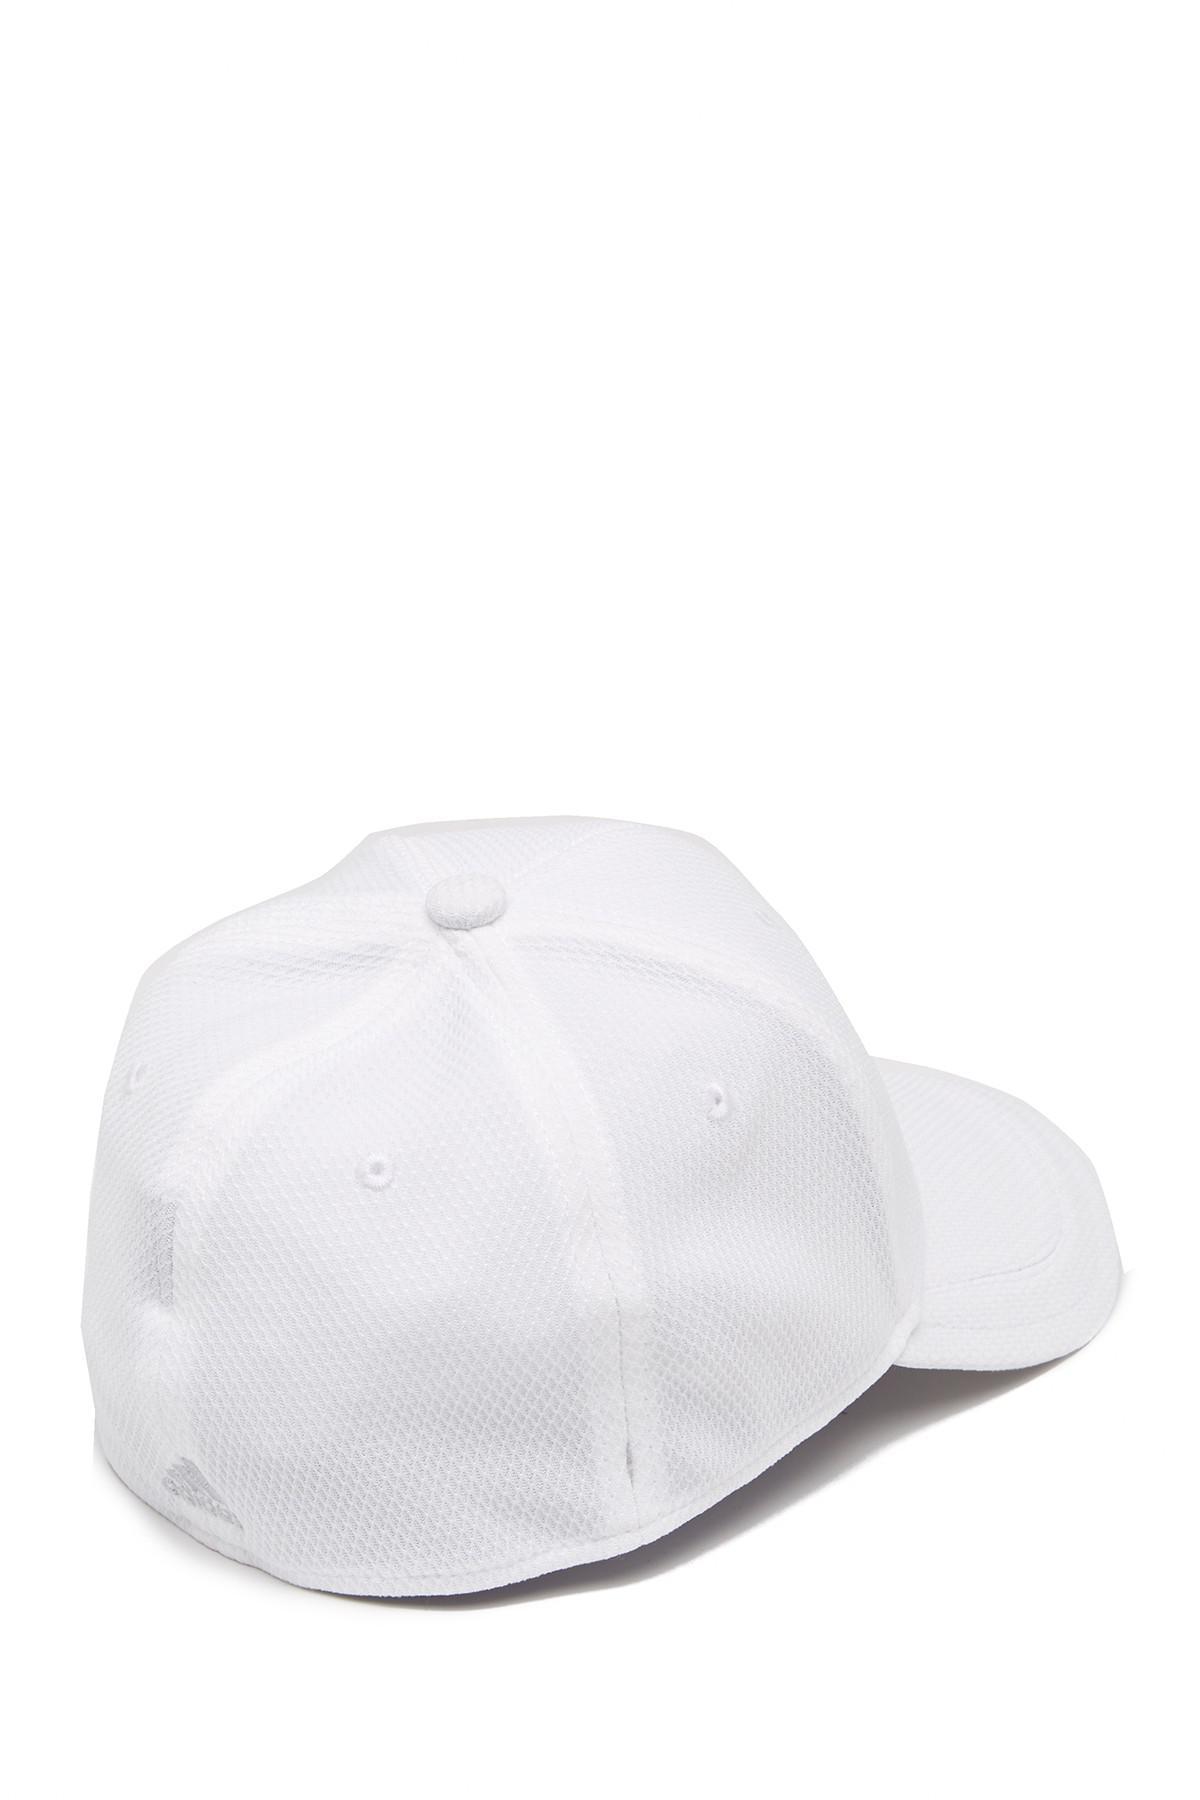 newest 3e637 e0872 Adidas - White Release Stretch Fit Cap for Men - Lyst. View fullscreen